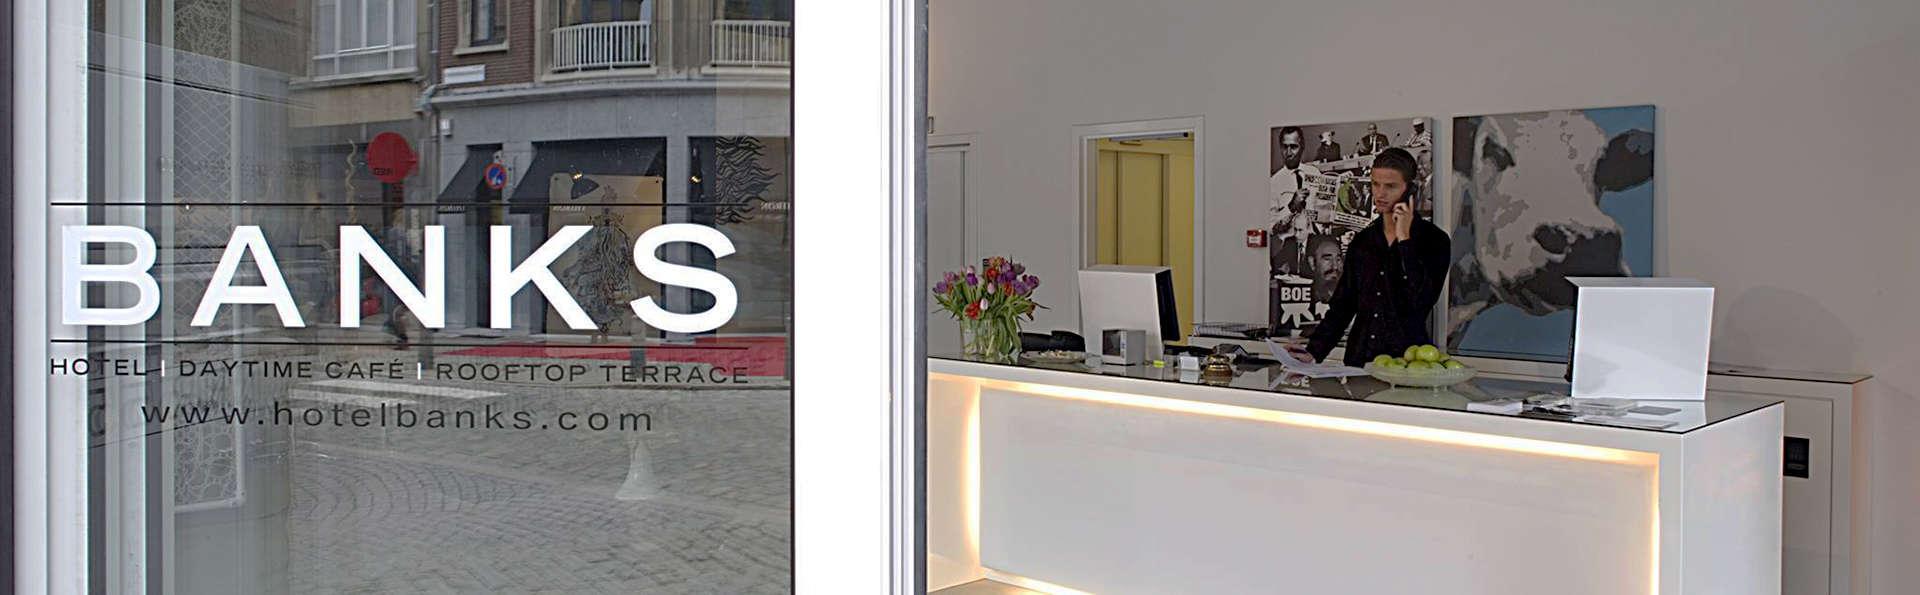 Banks - EDIT_Reception1.jpg